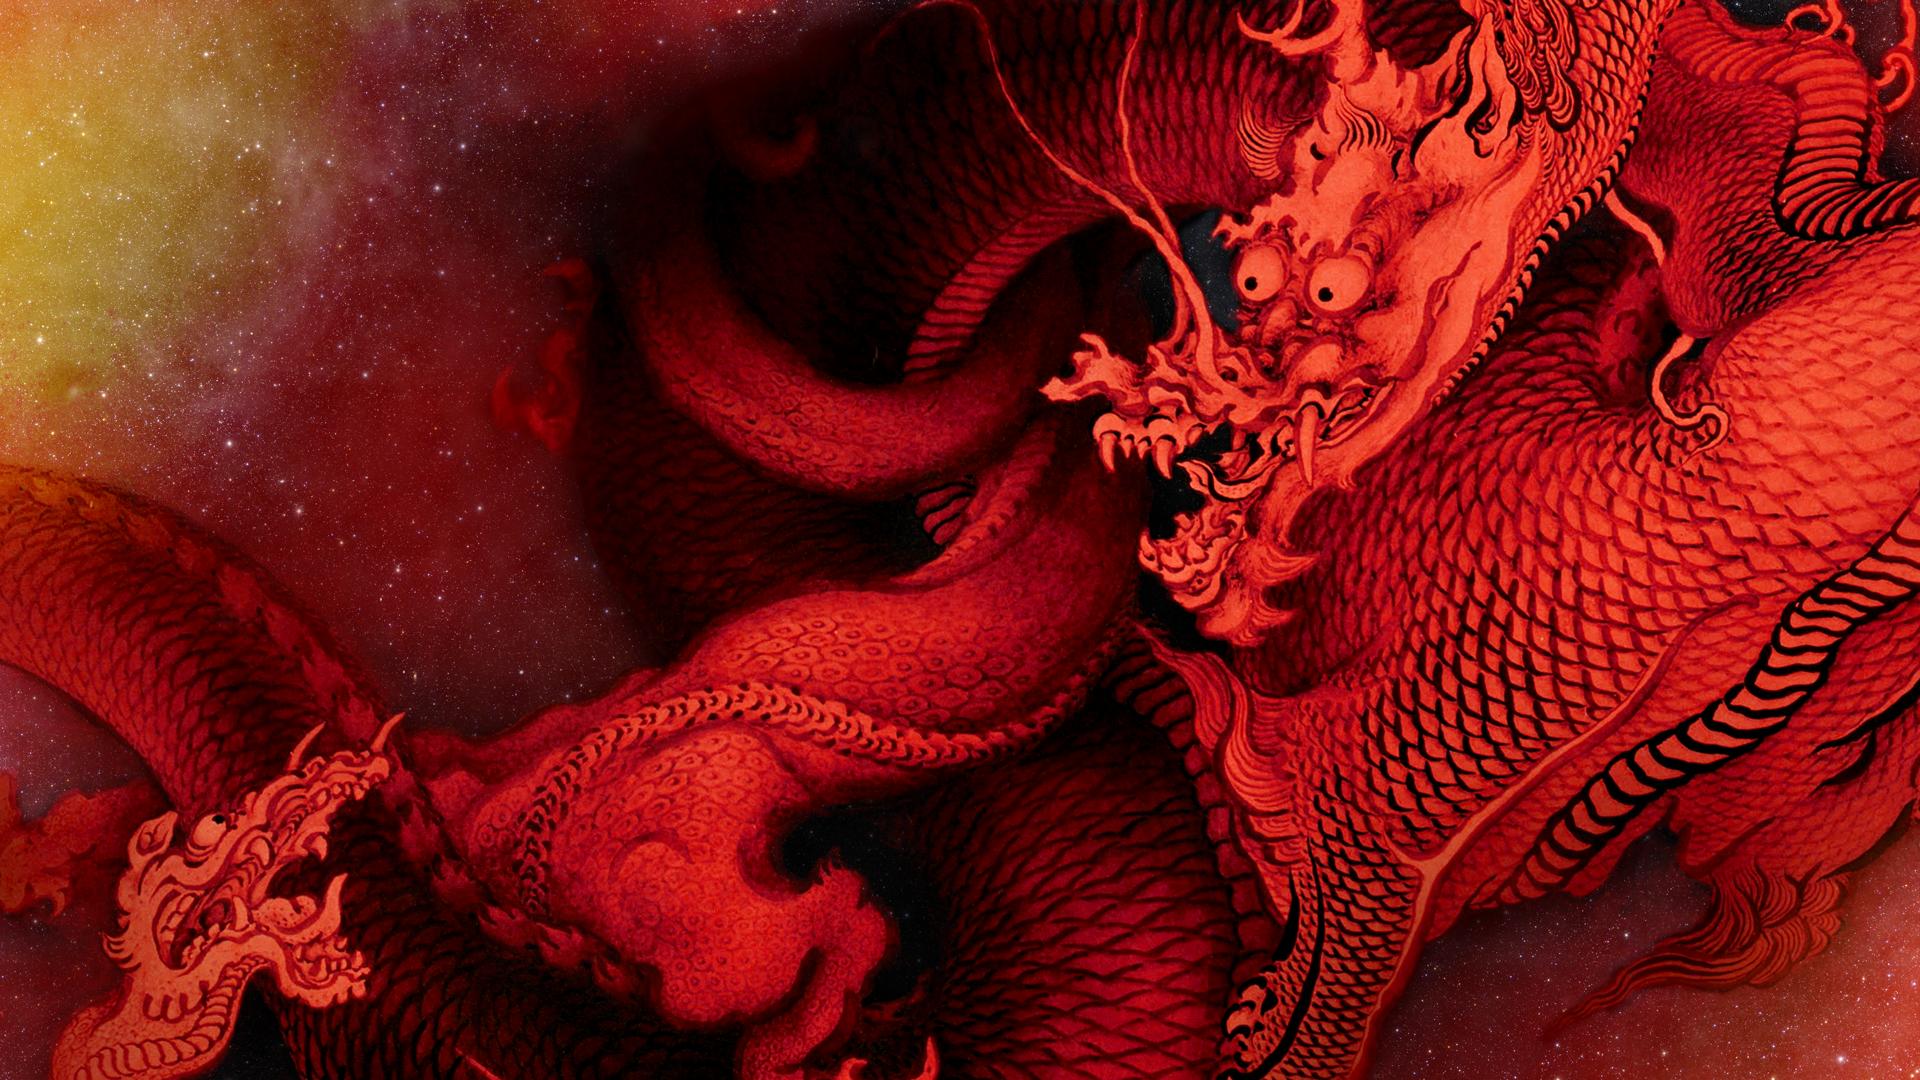 Red Wallpapers 1920x1080 4k 1920x1080 Download Hd Wallpaper Wallpapertip